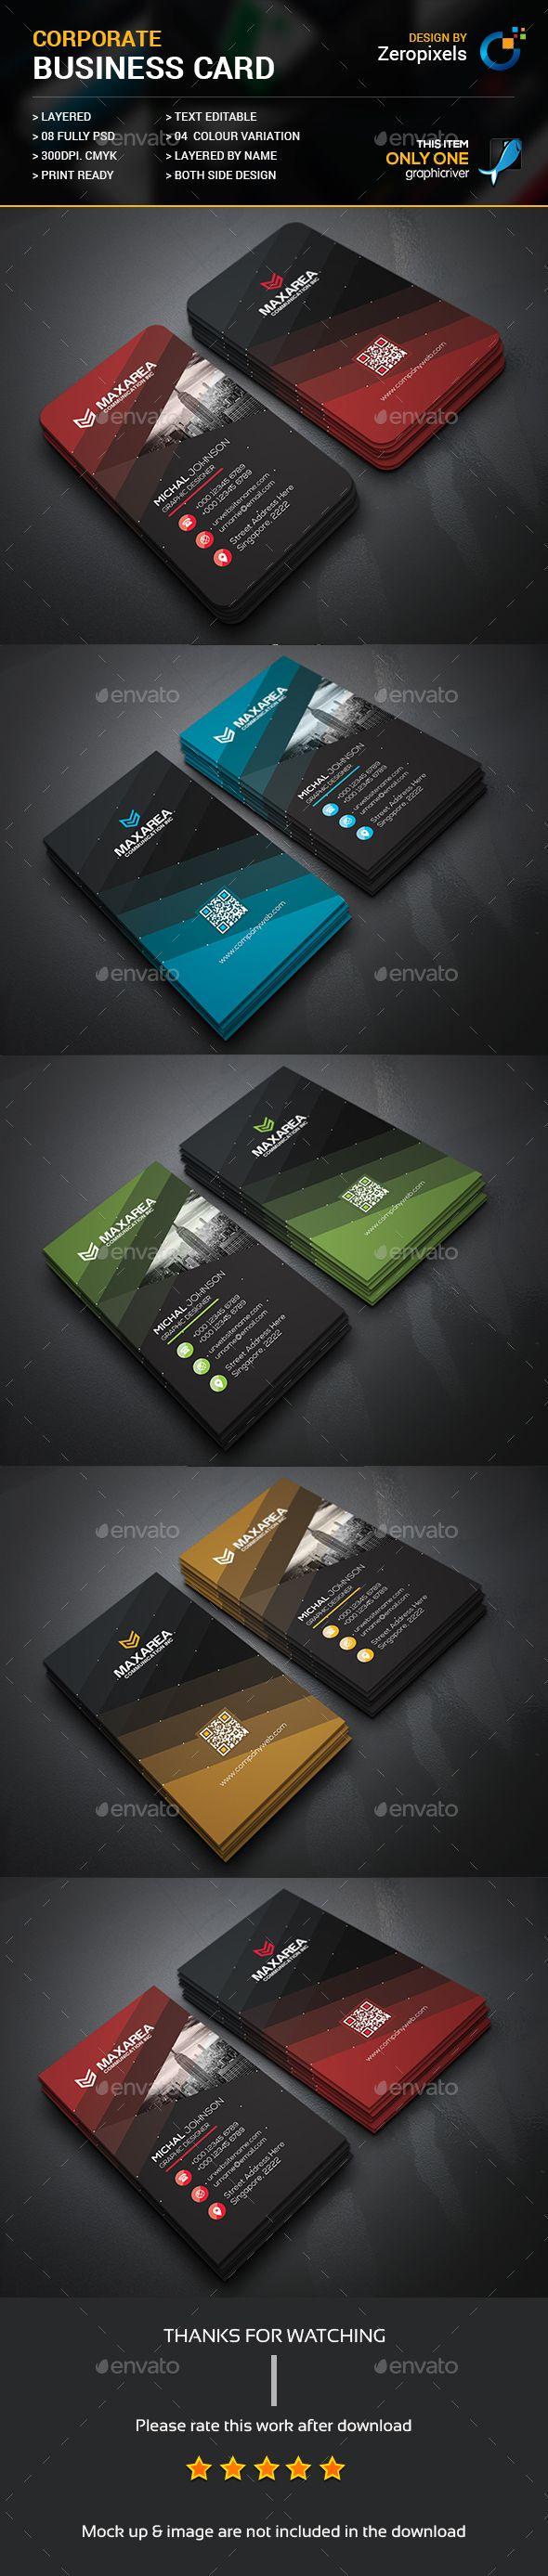 Business card template psd business card templates pinterest business card template psd flashek Choice Image